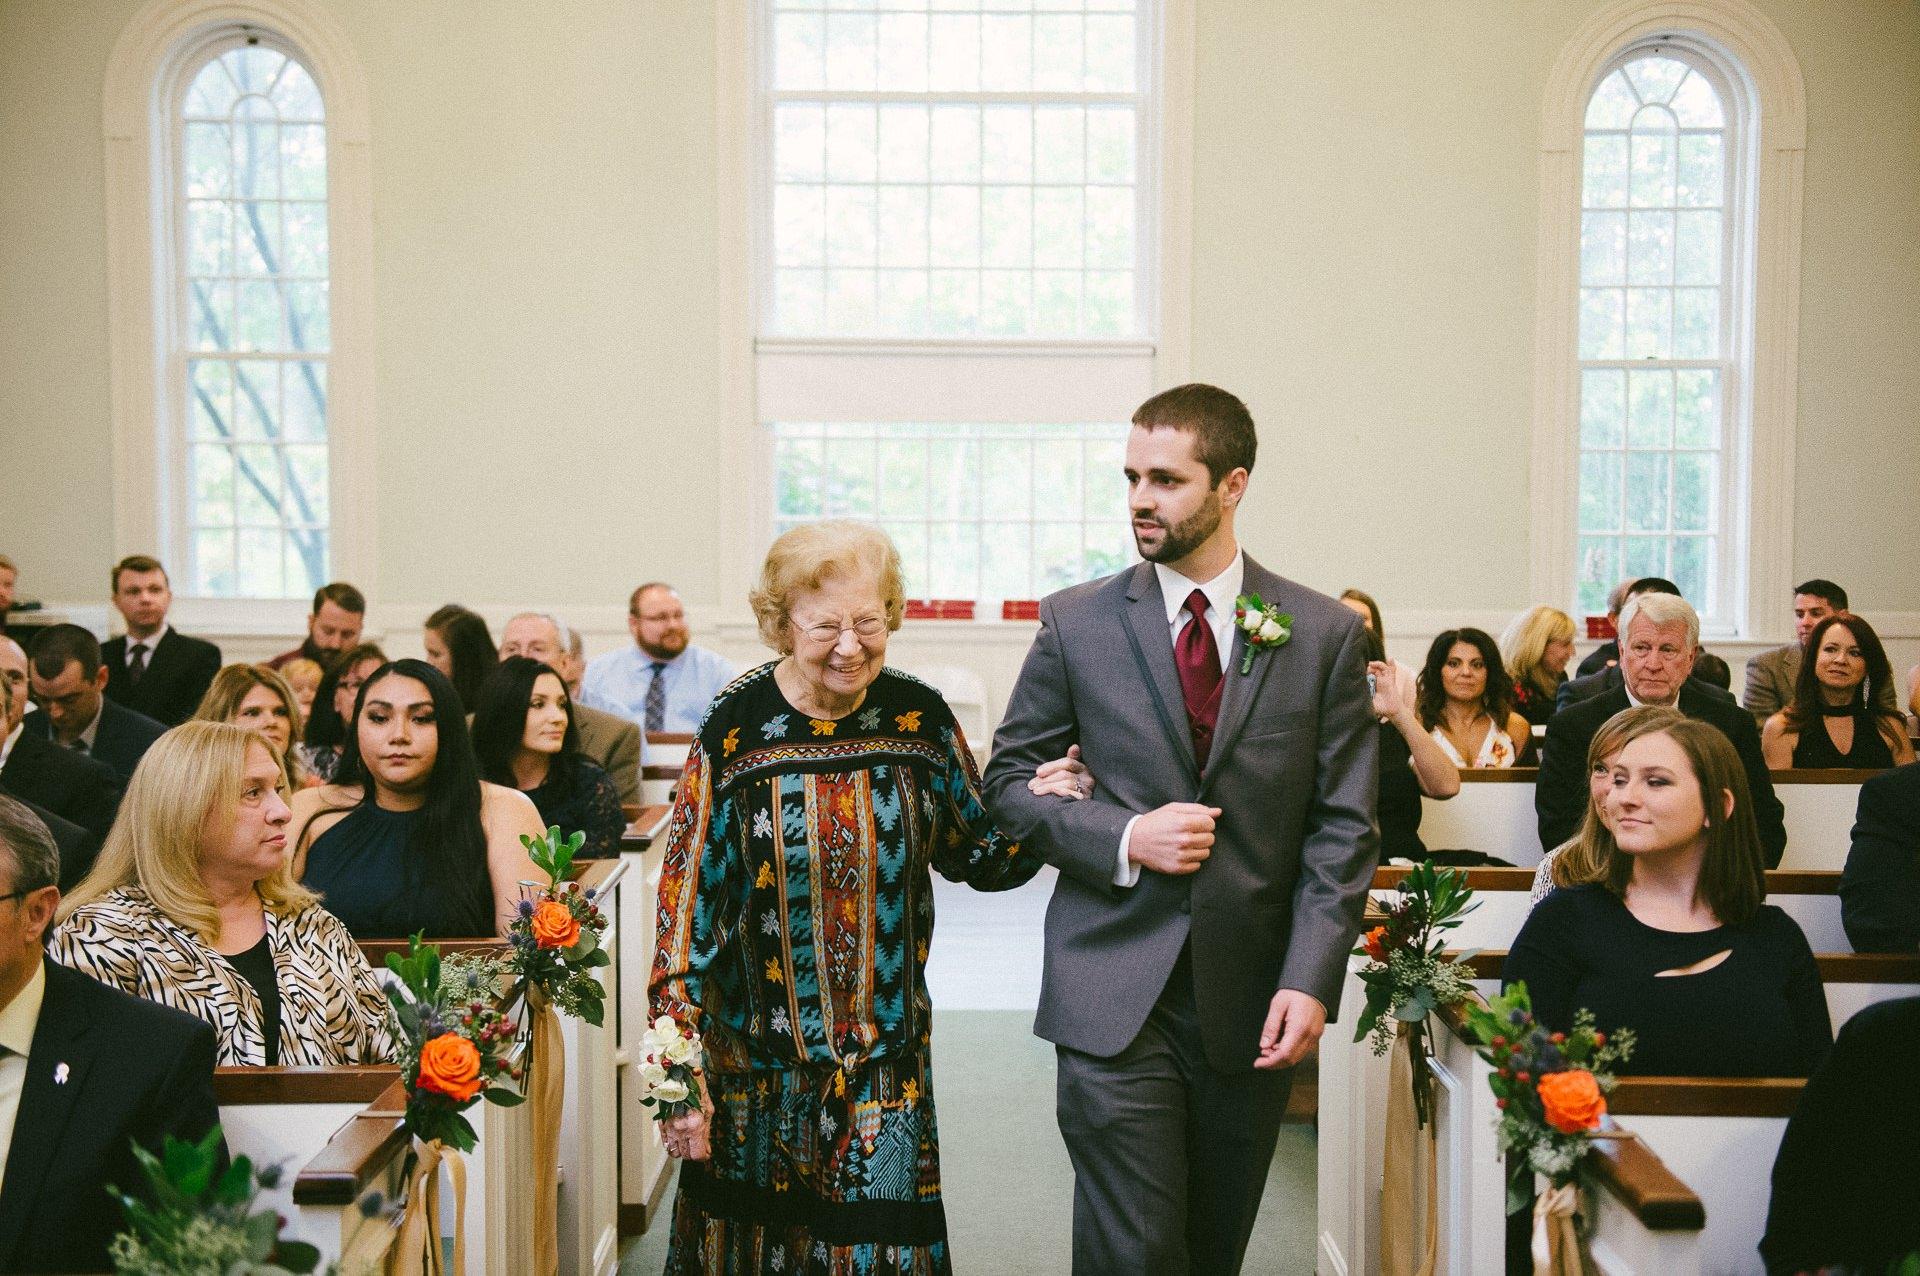 Patterson Fruit Farm Wedding Photographer in Cleveland 1 15.jpg